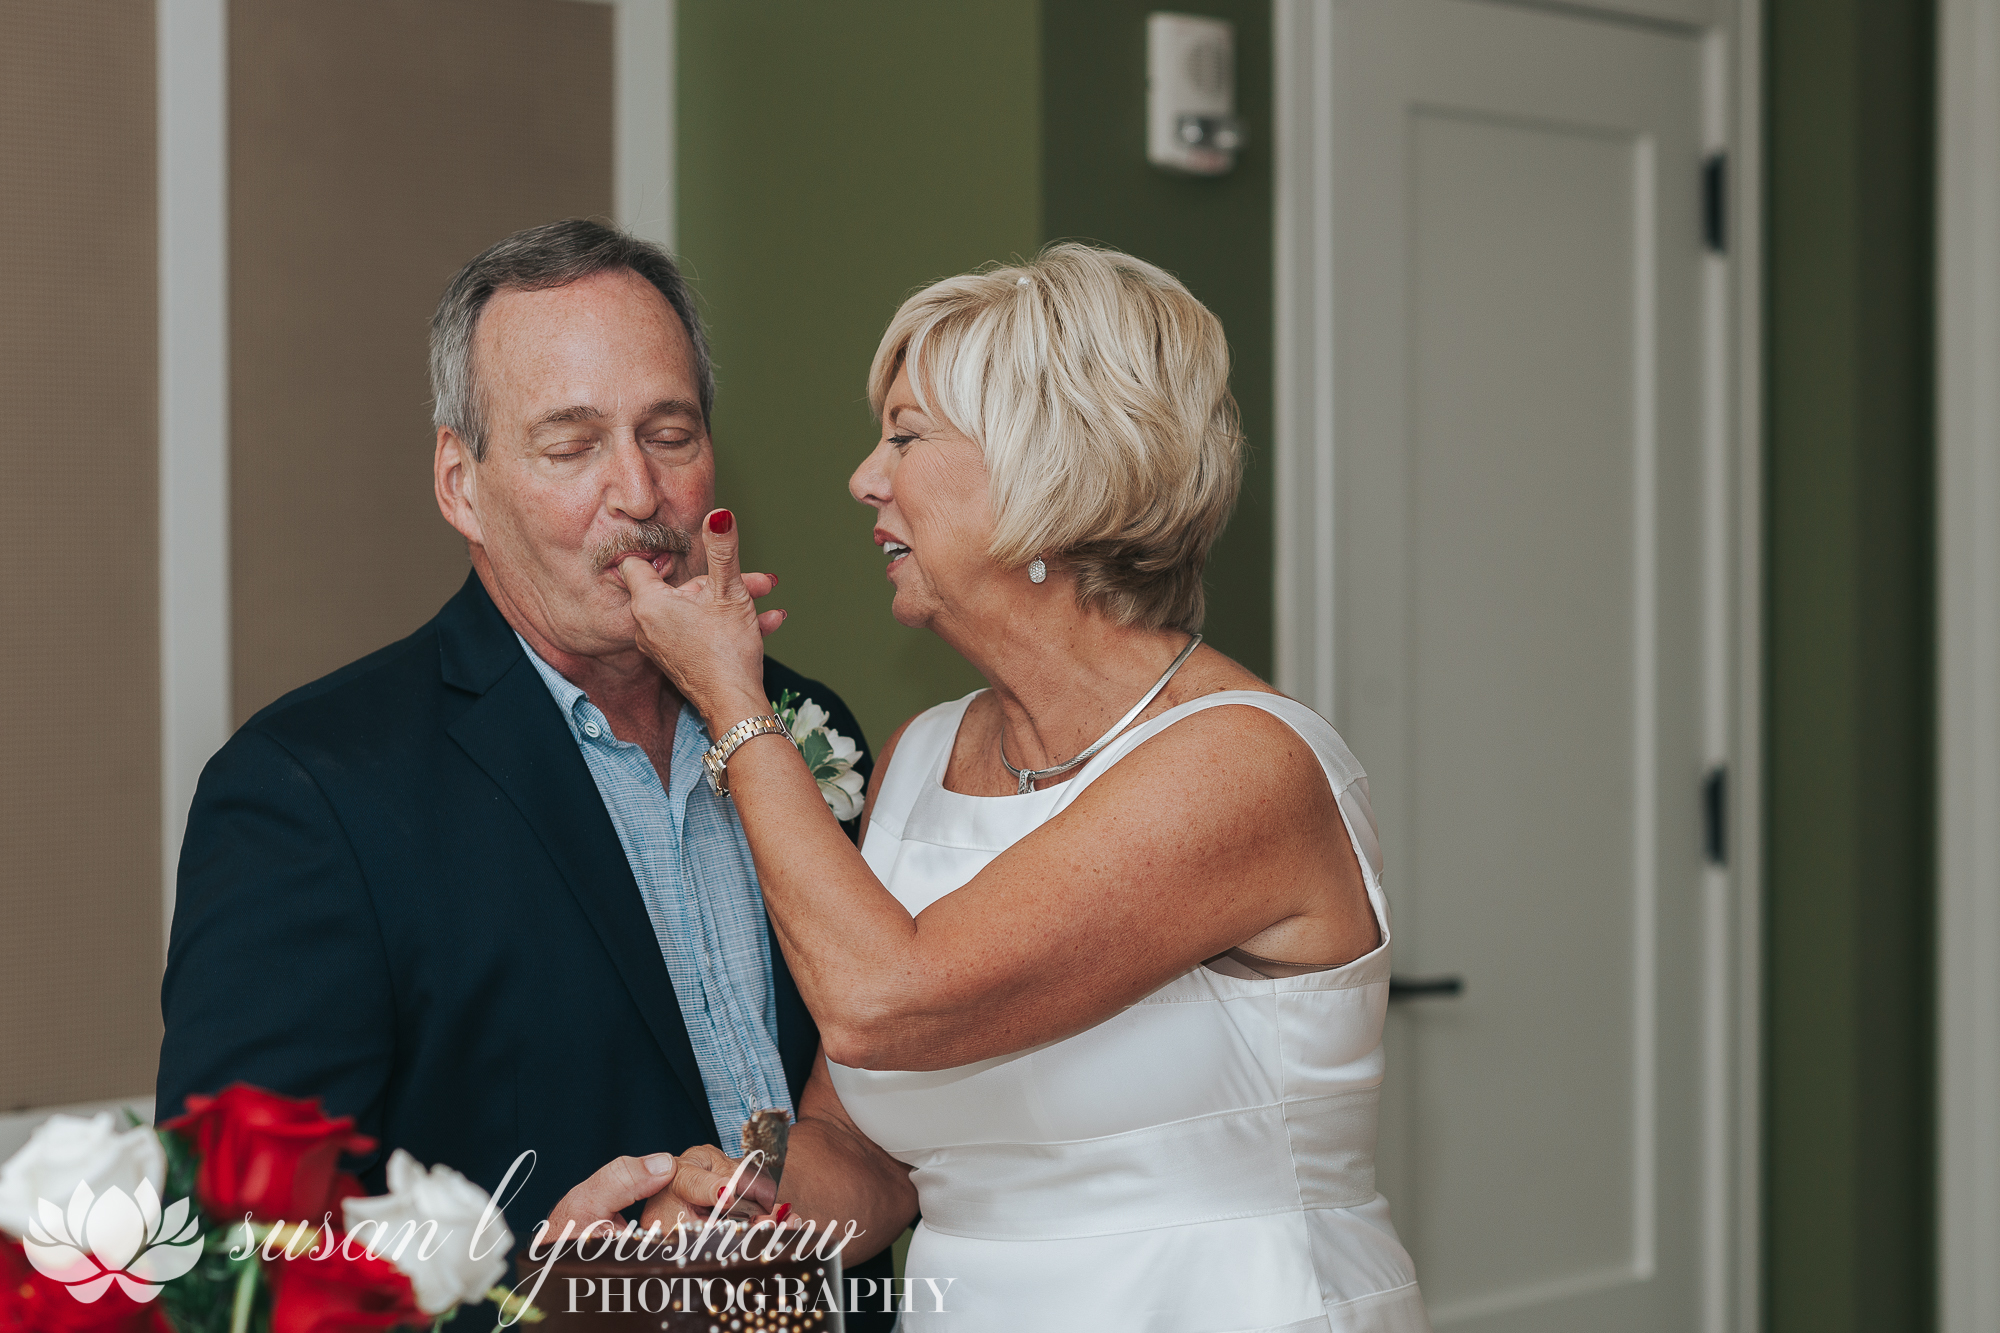 BLOG Carolyn Adams and Jim McCune 07-04-2018 SLY Photography-151.jpg